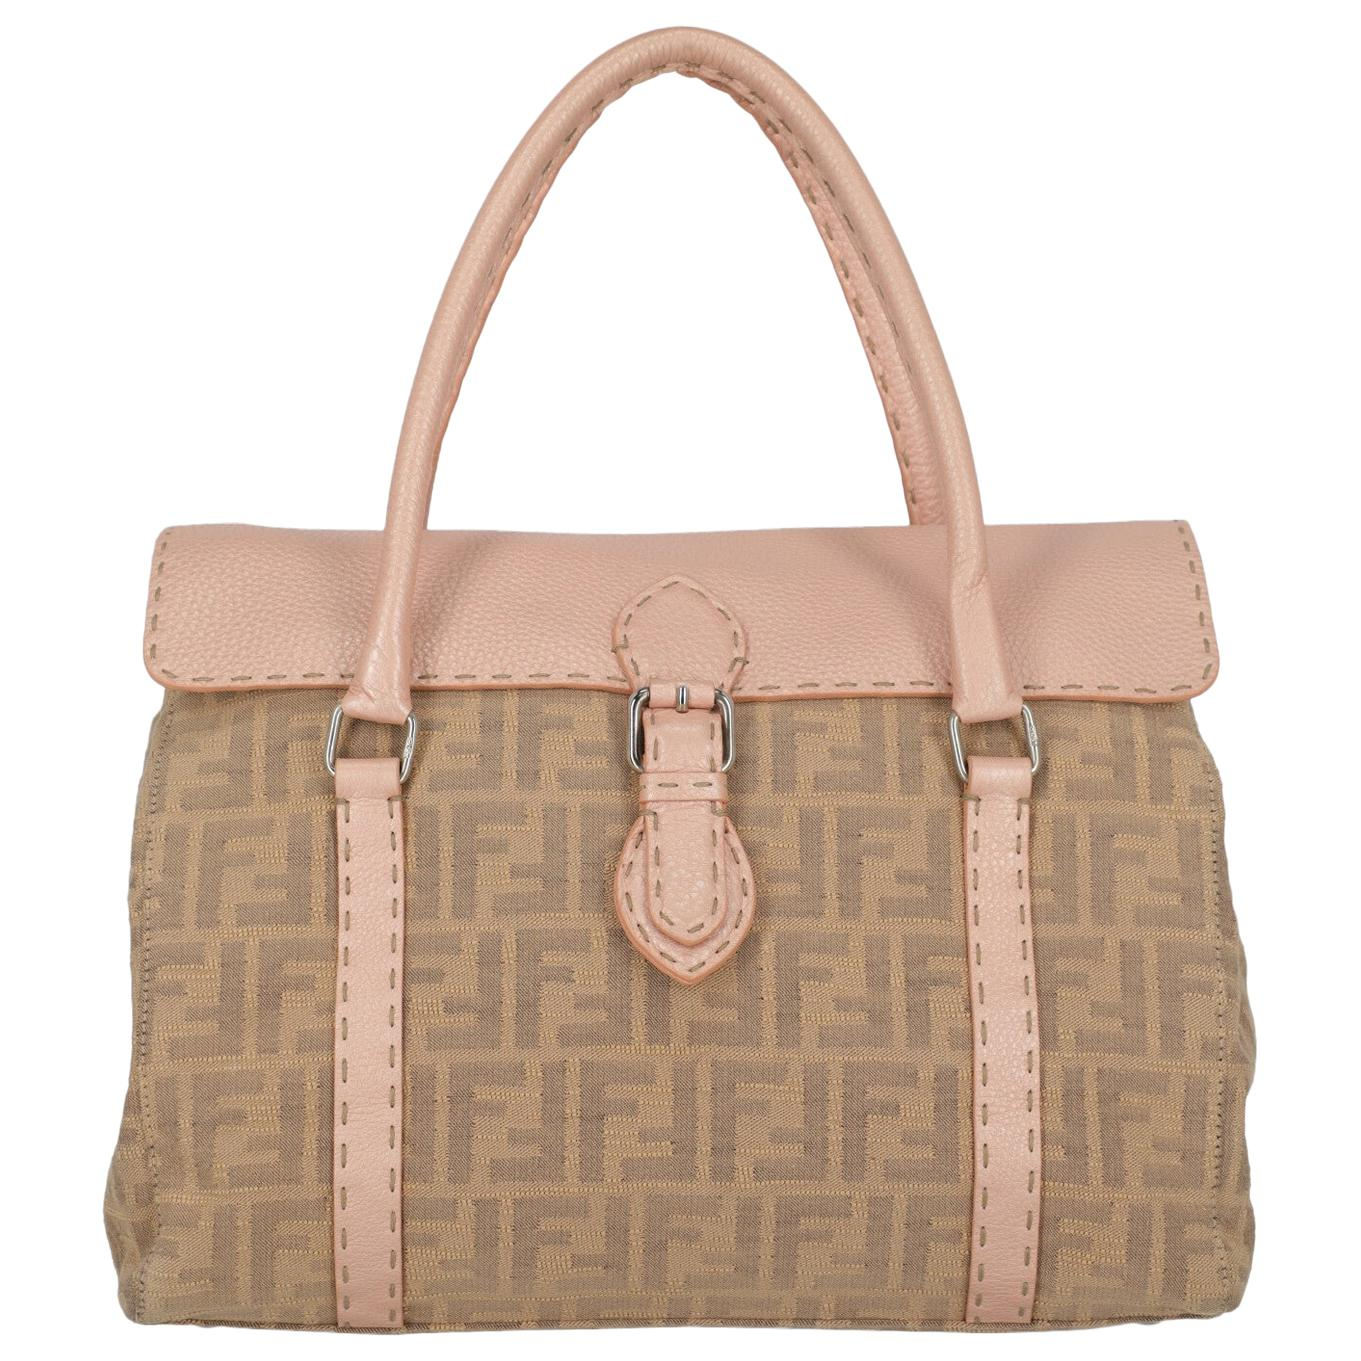 Fendi Woman Handbag Beige Fabric